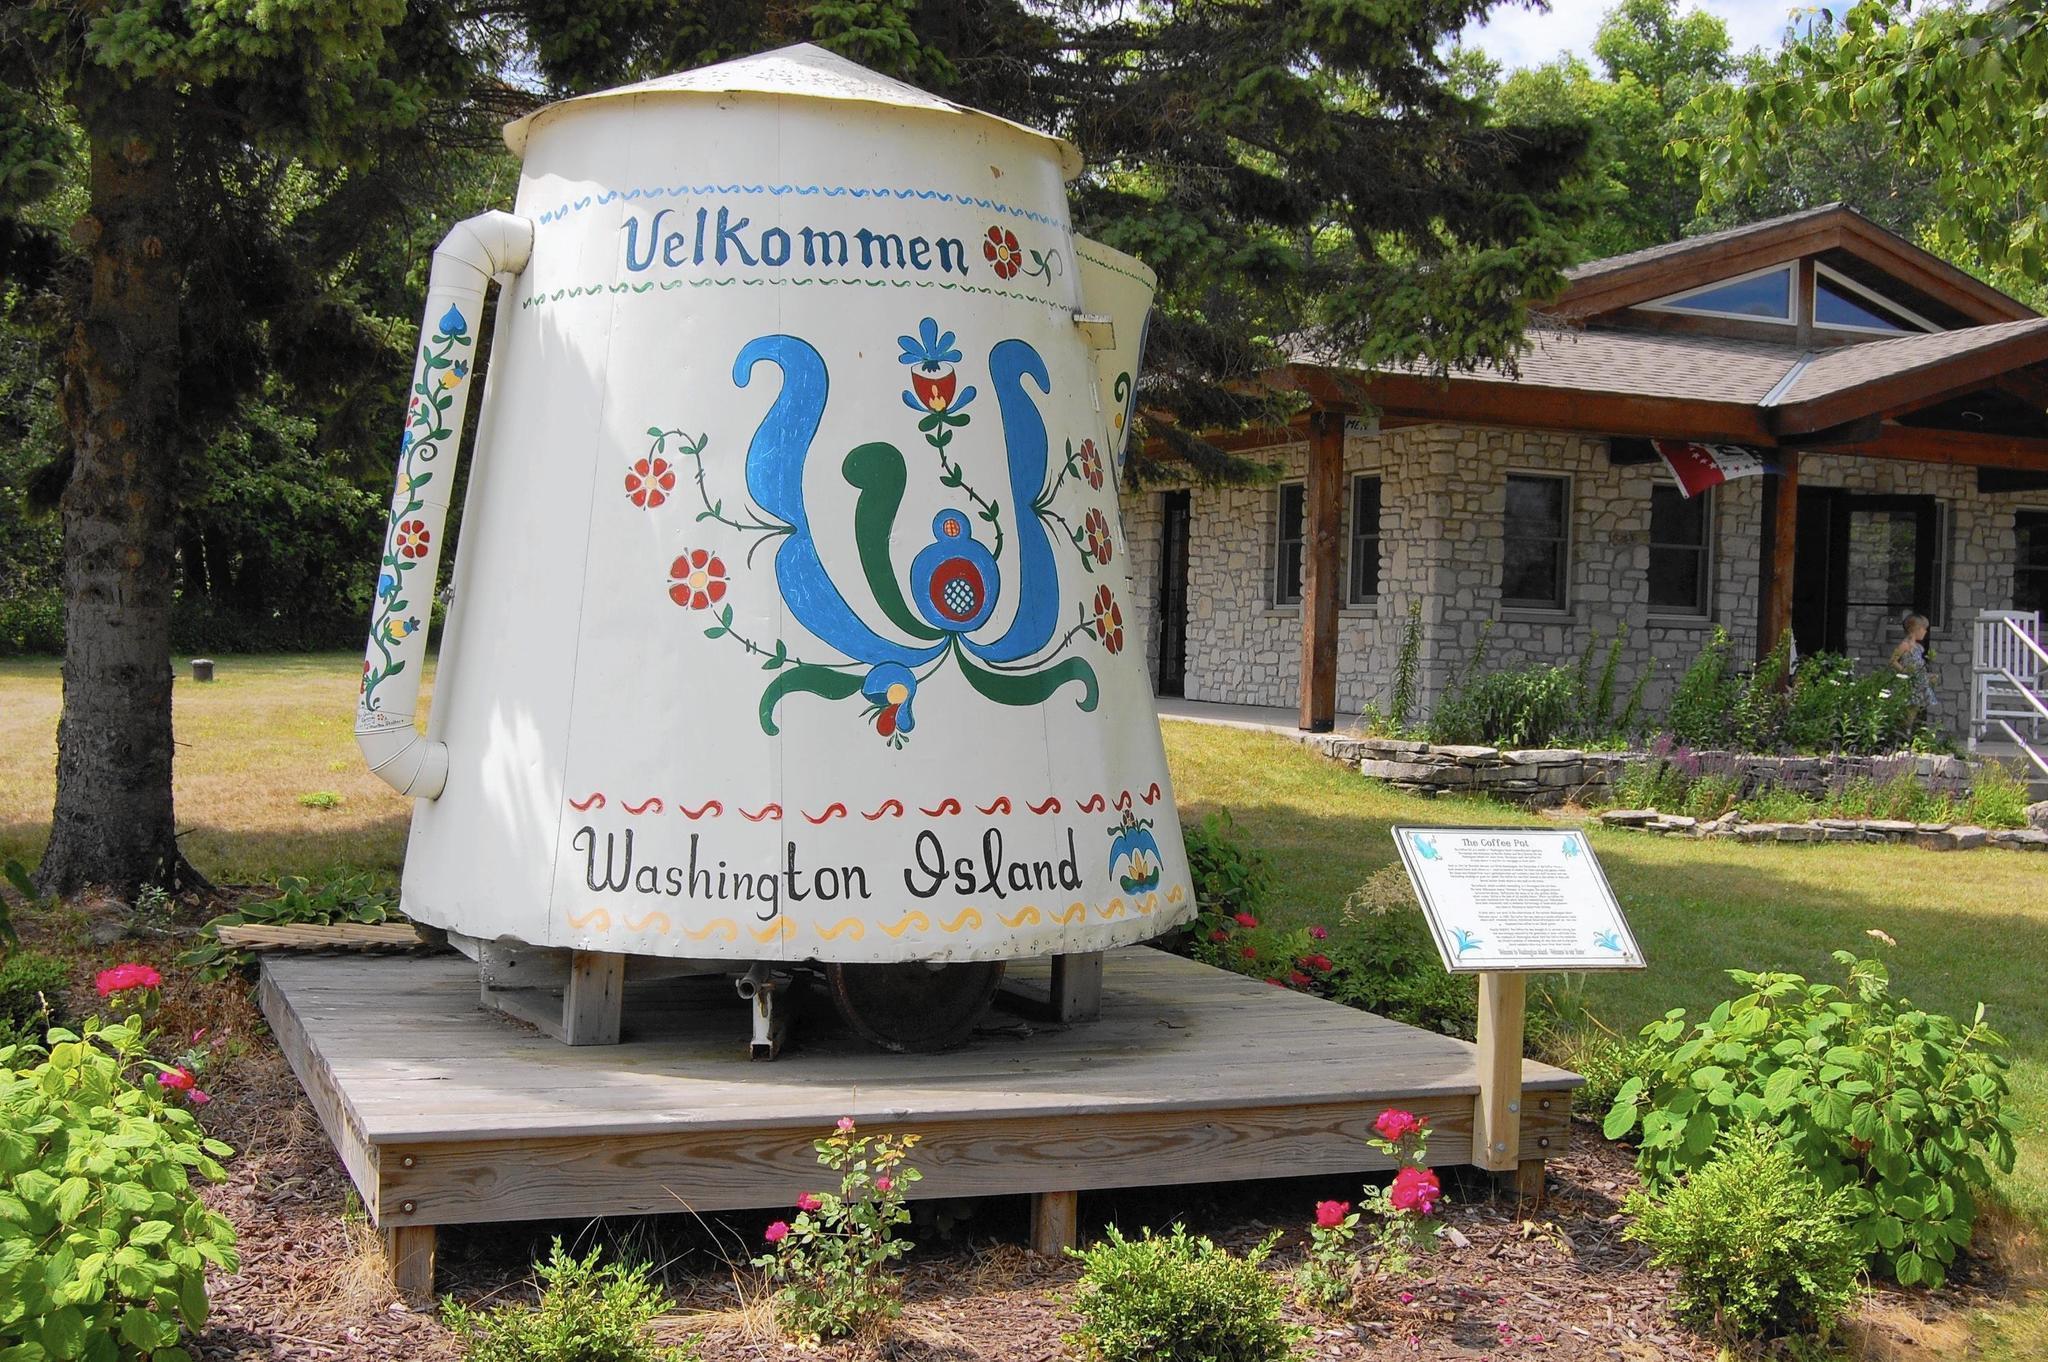 Scandinavian heritage quirky charm await on winsome Washington Island - Chicago Tribune & Scandinavian heritage quirky charm await on winsome Washington ...